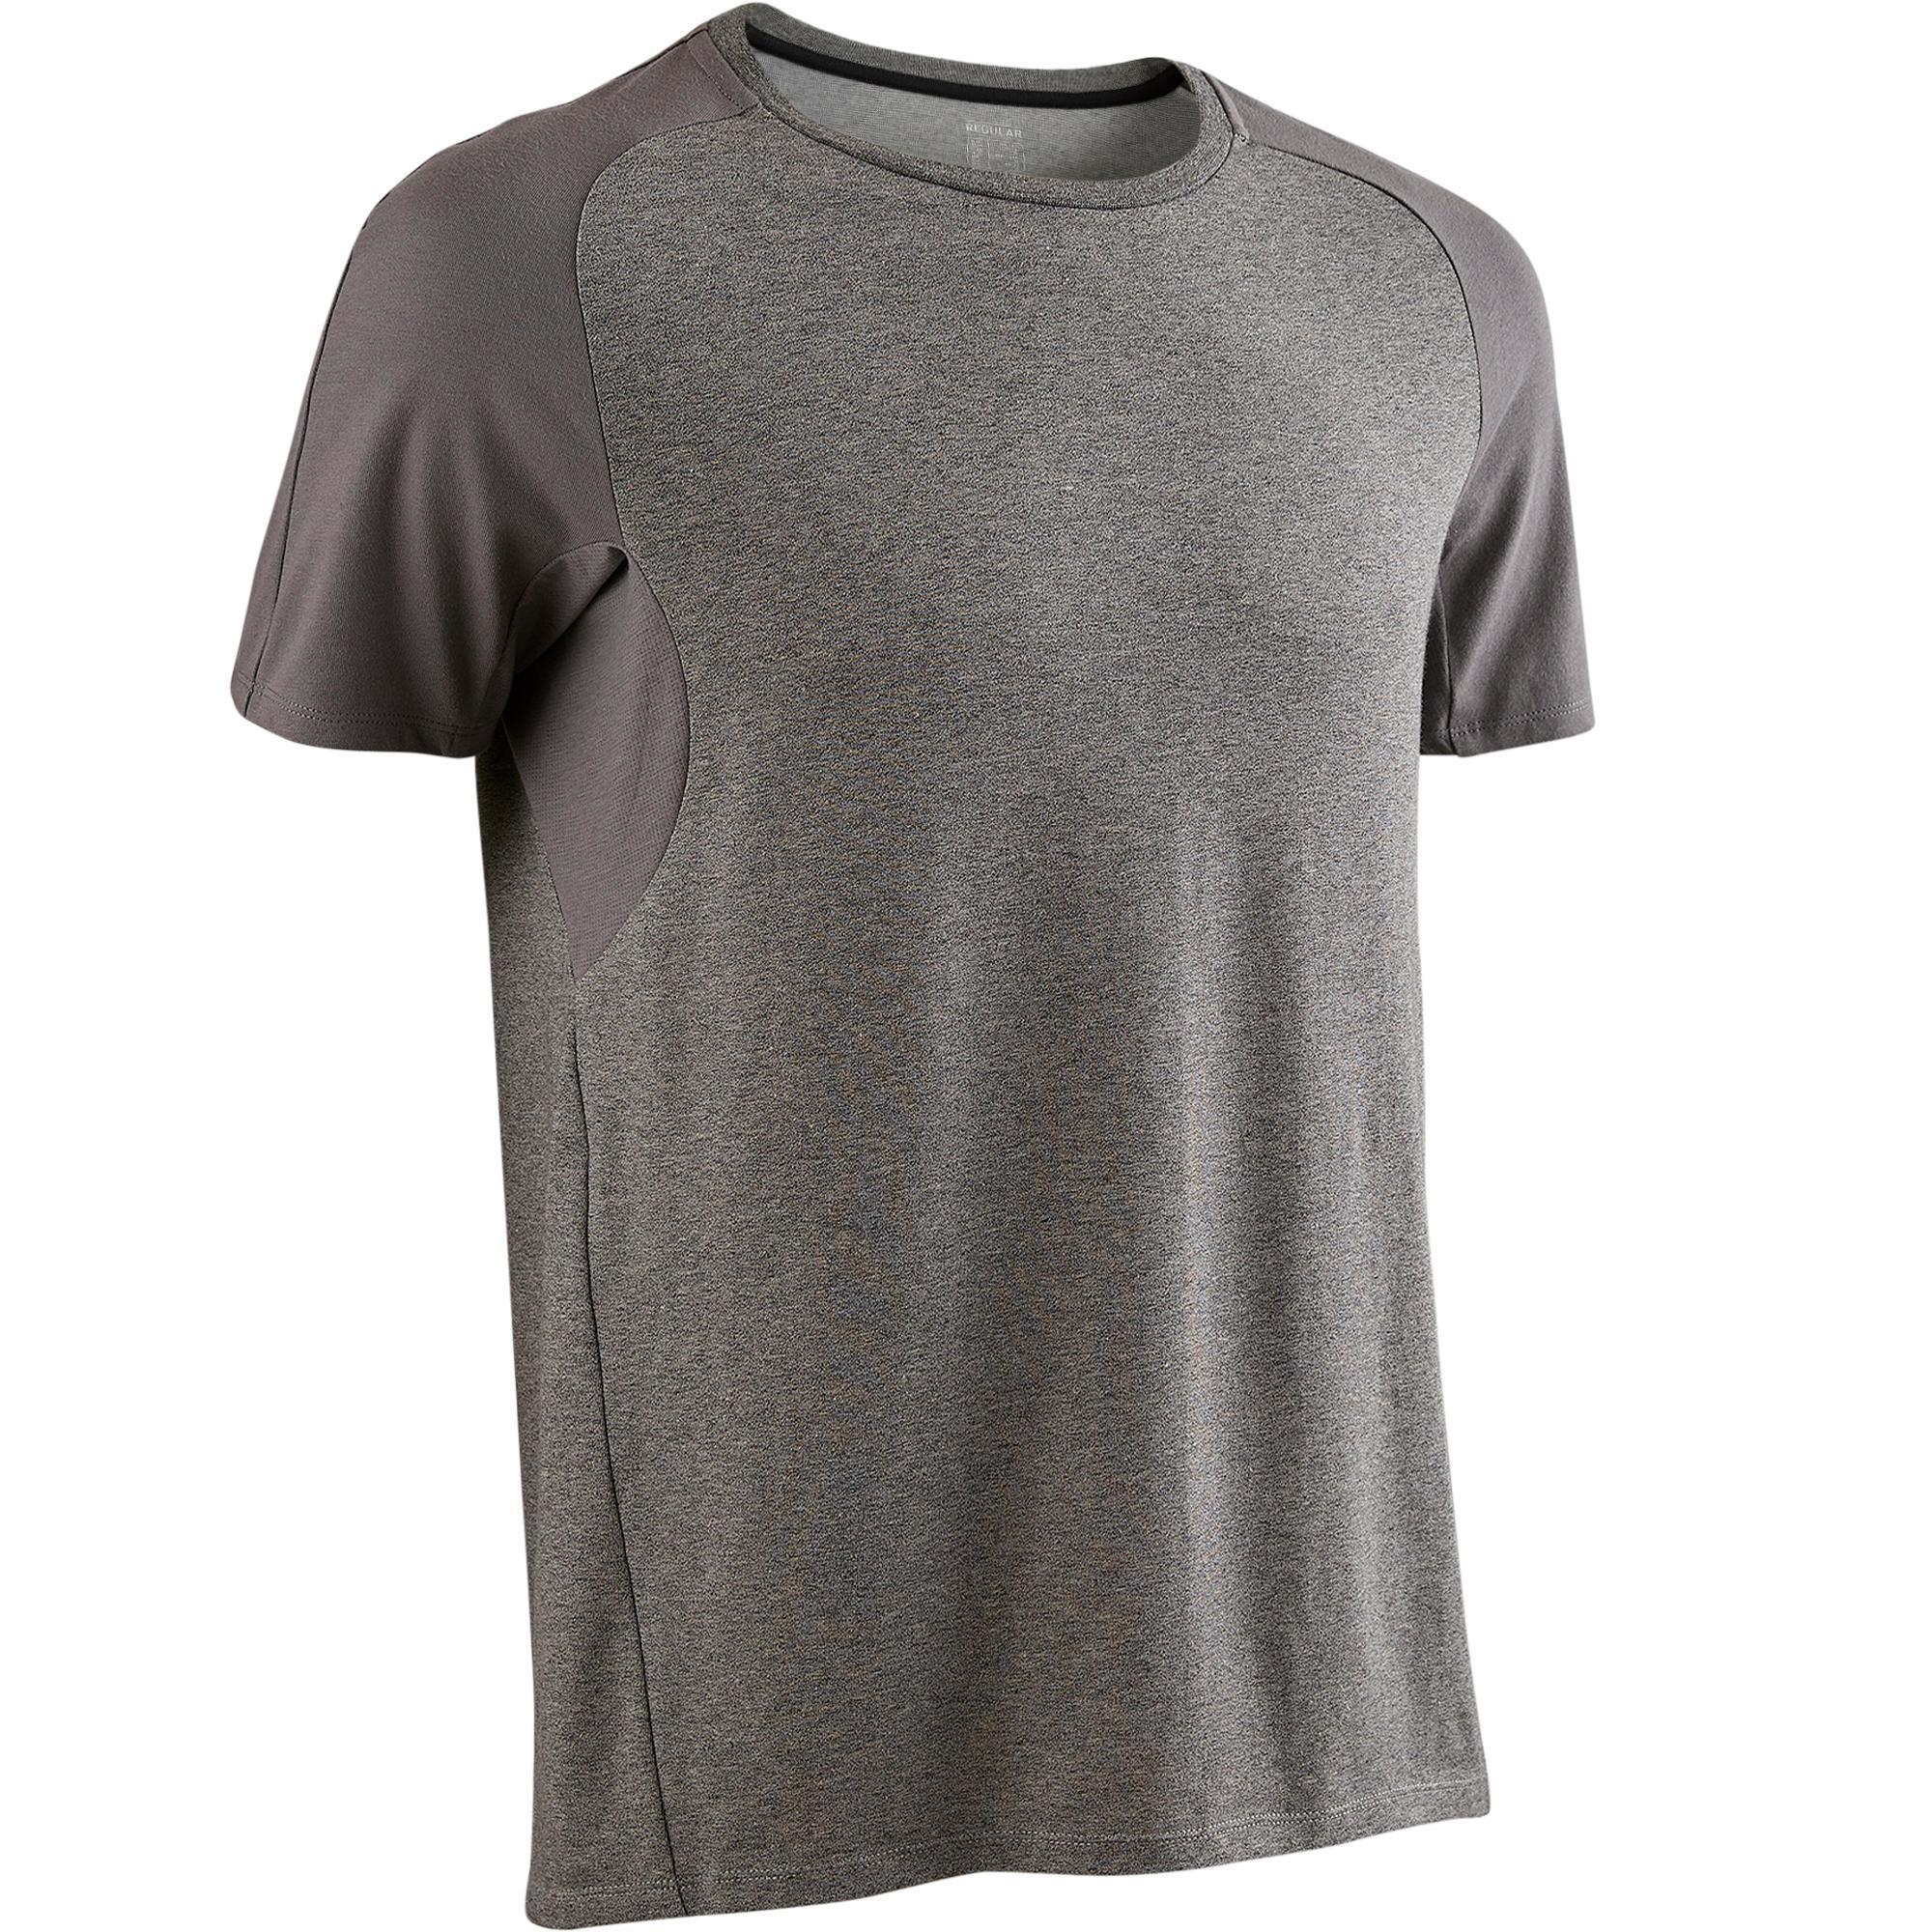 T-Shirt 520 Regular Gym & Pilates Herren hellgrau meliert | Sportbekleidung > Sportshirts > Poloshirts | Grau | Domyos